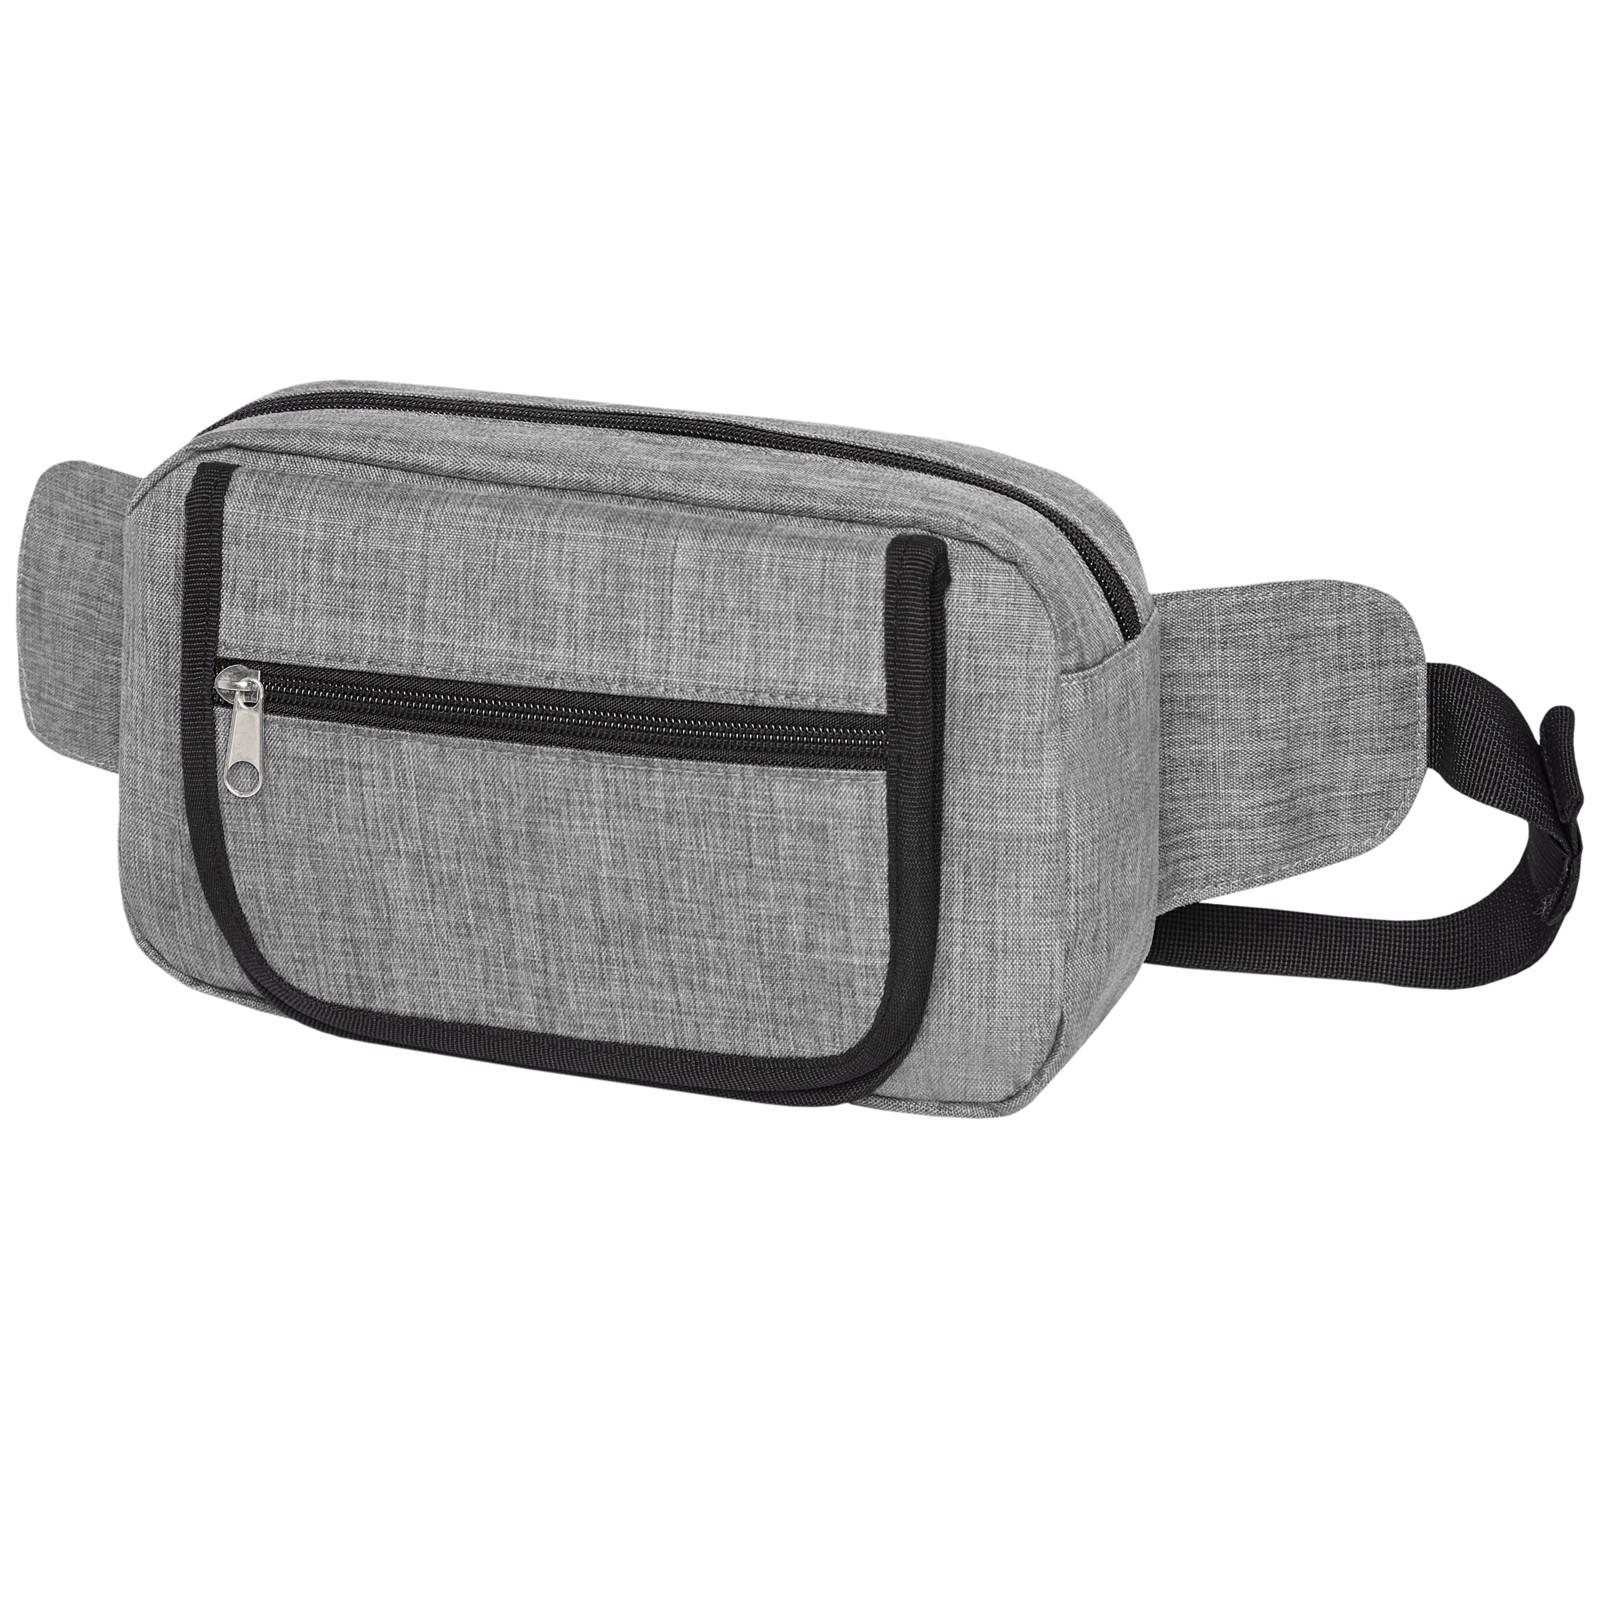 Hoss fanny pack - Heather medium grey